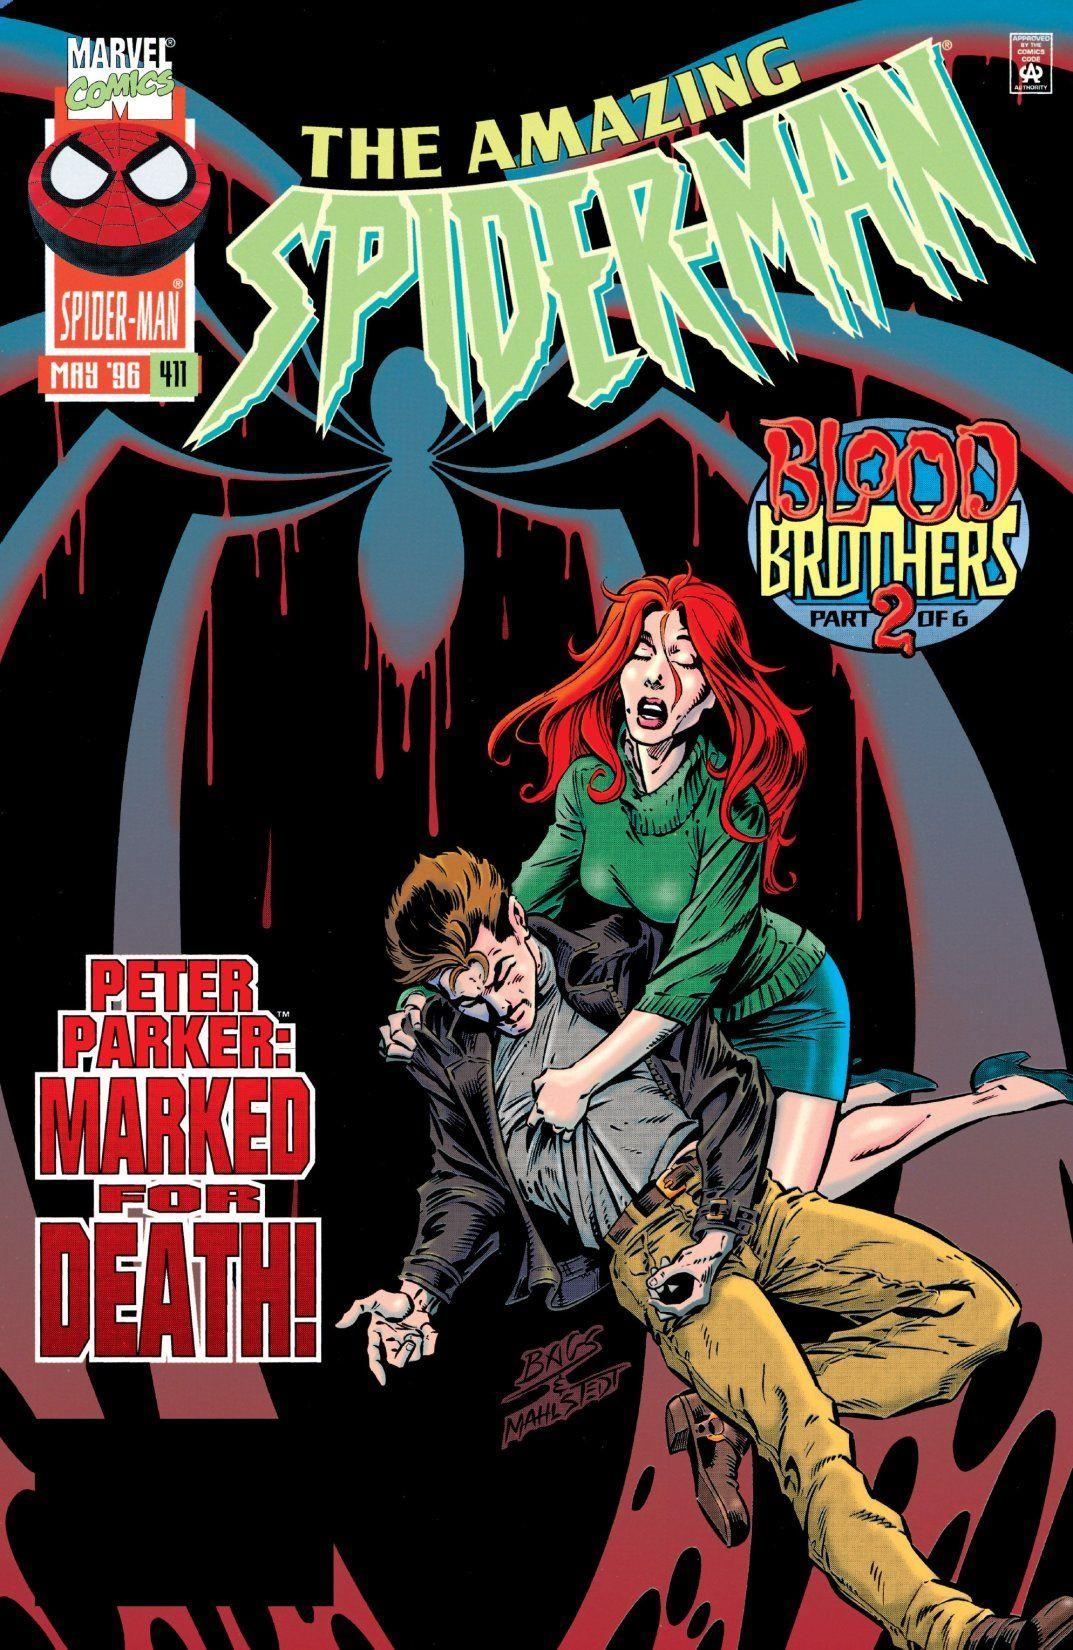 Spider-Man: The Complete Ben Reilly Epic Vol 1 4